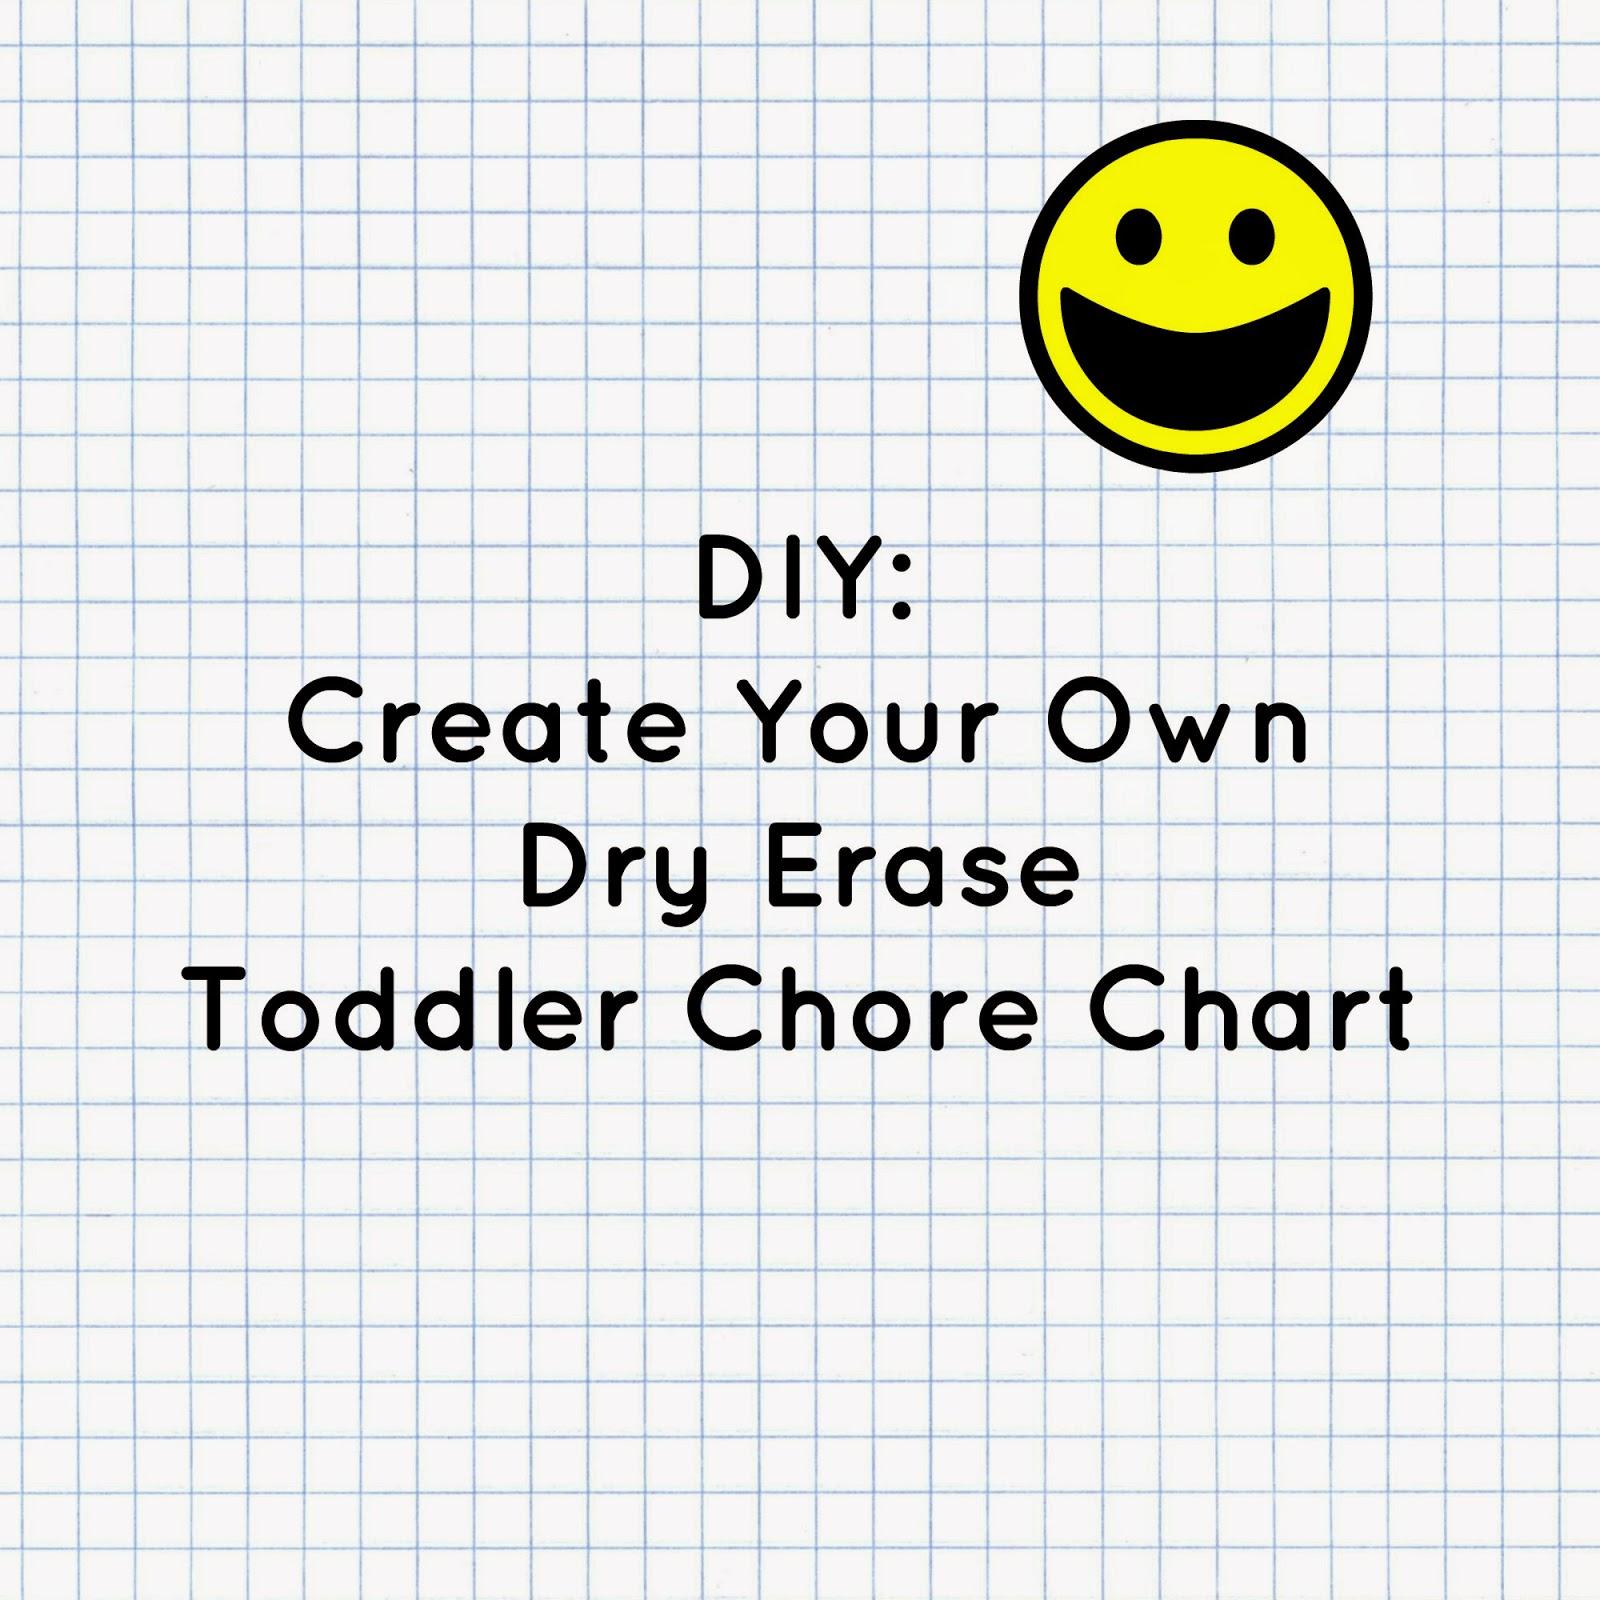 diy create dry erase chore chart or free printable